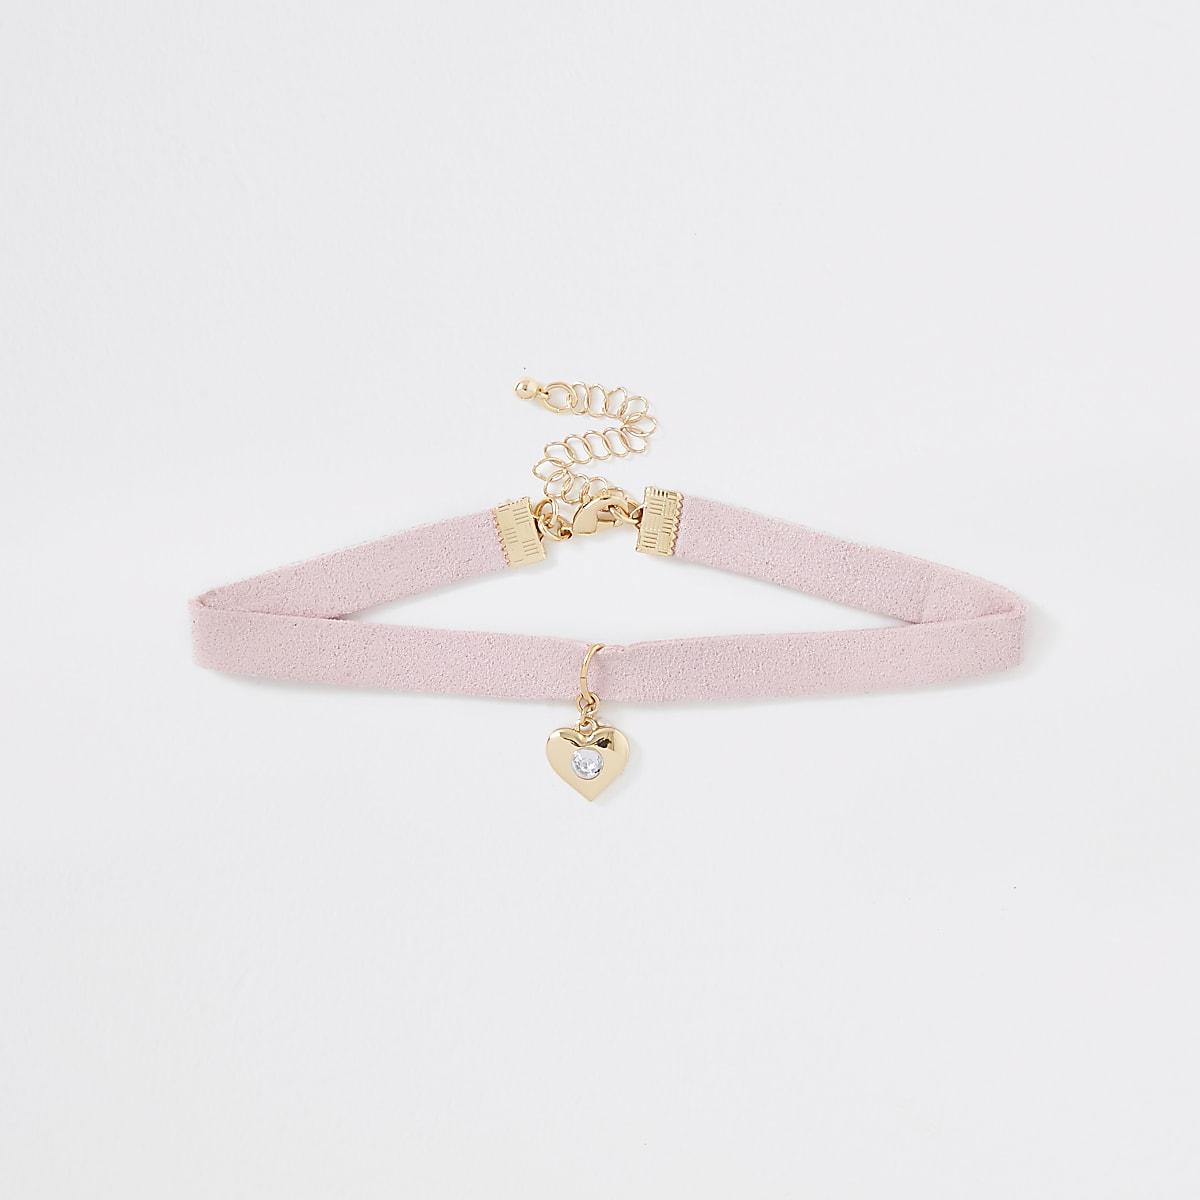 Girls pink heart charm choker